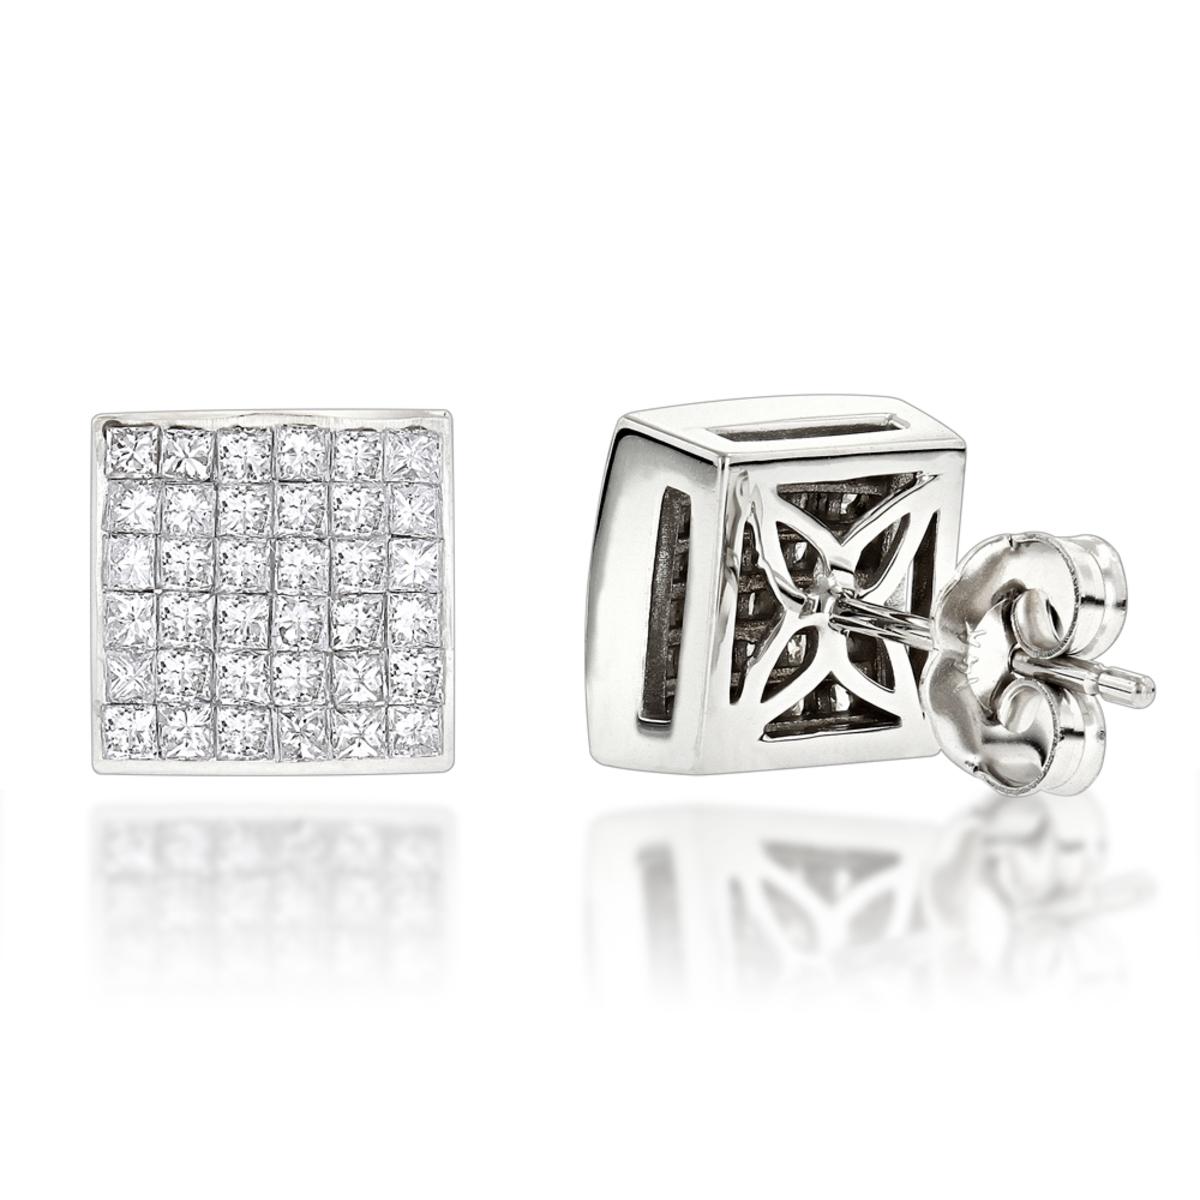 Princess Cut Diamond Stud Earrings 14K 1.65ct Invisible Setting